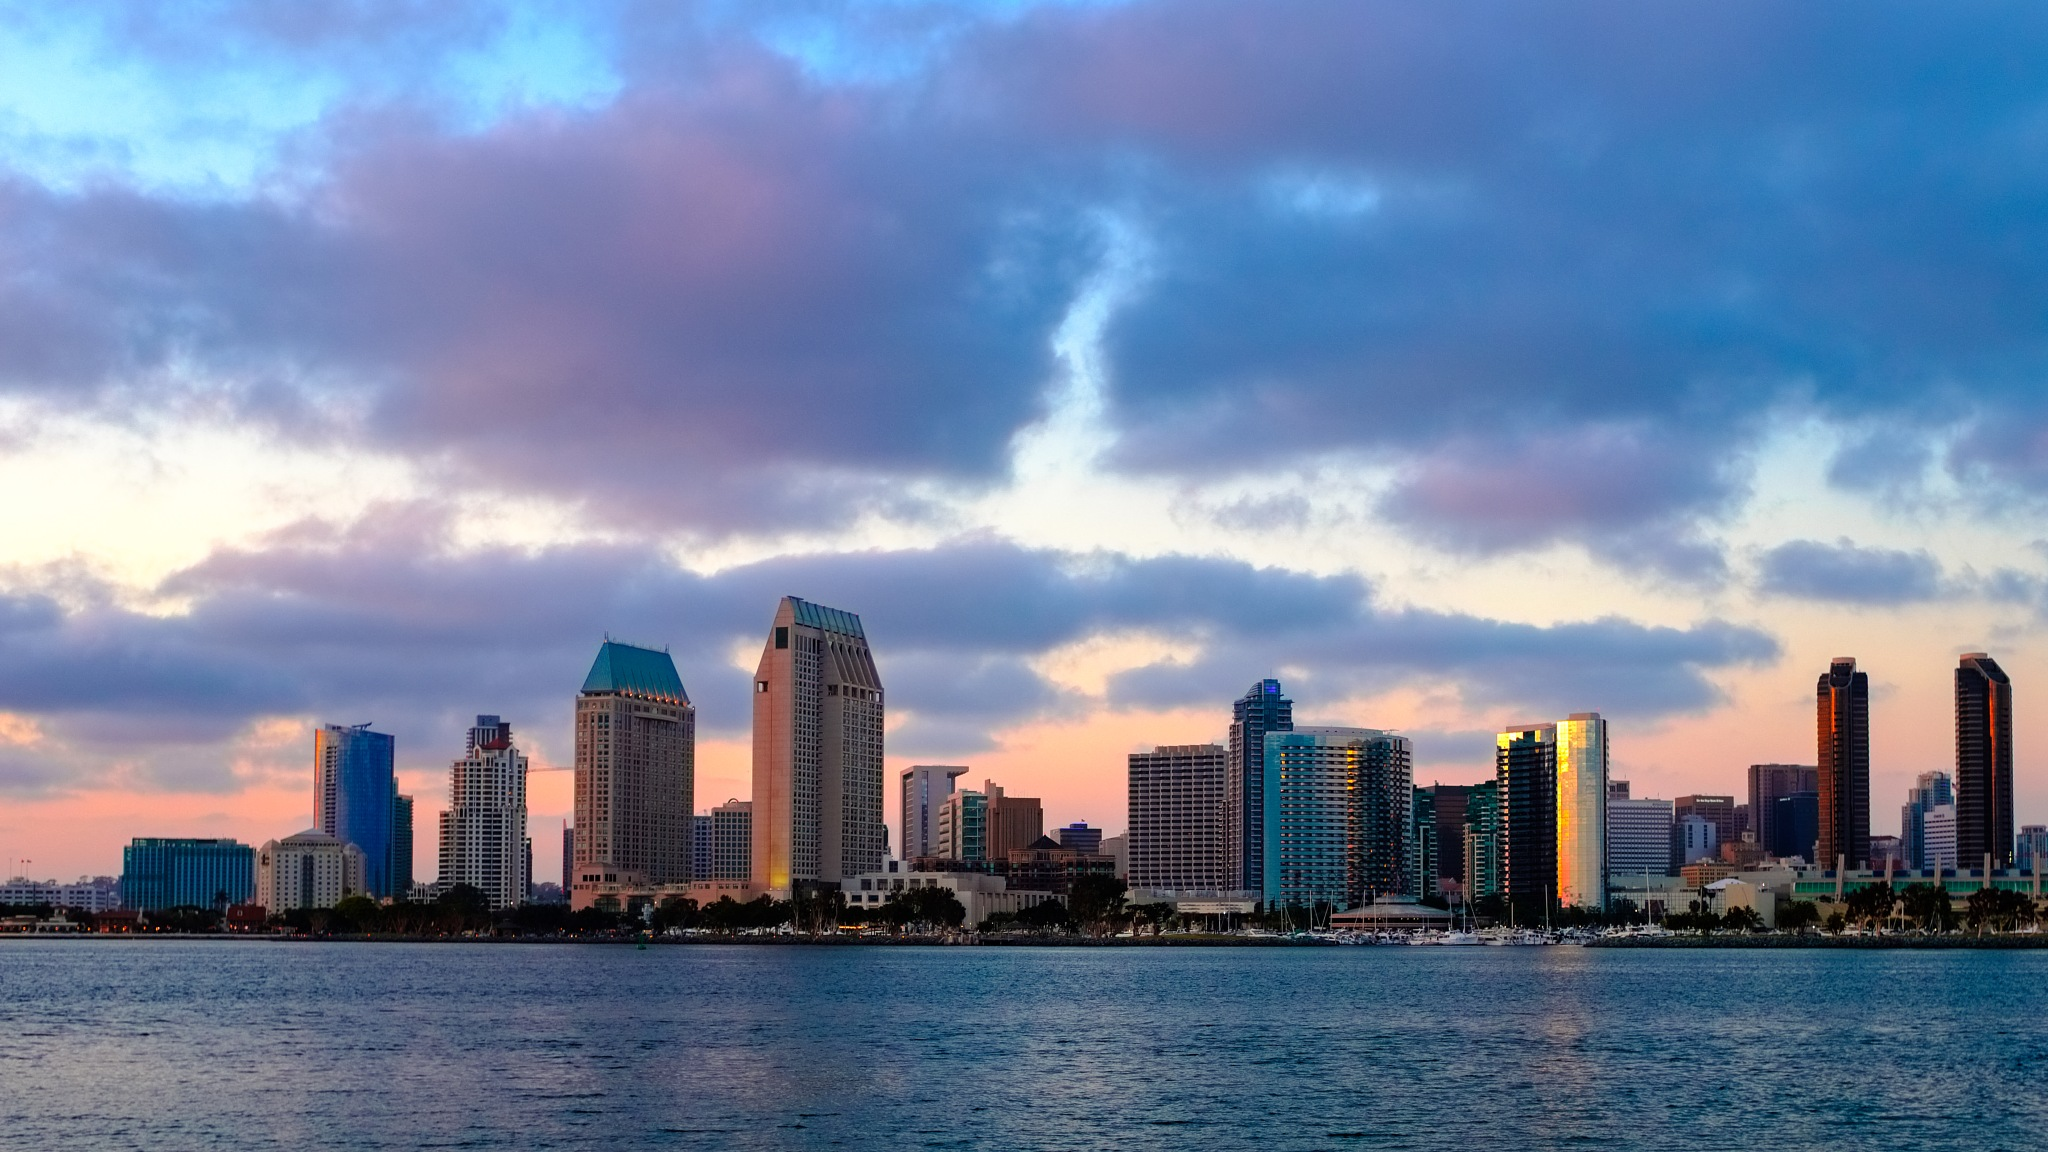 San Diego Skyline by Hansel Tjia